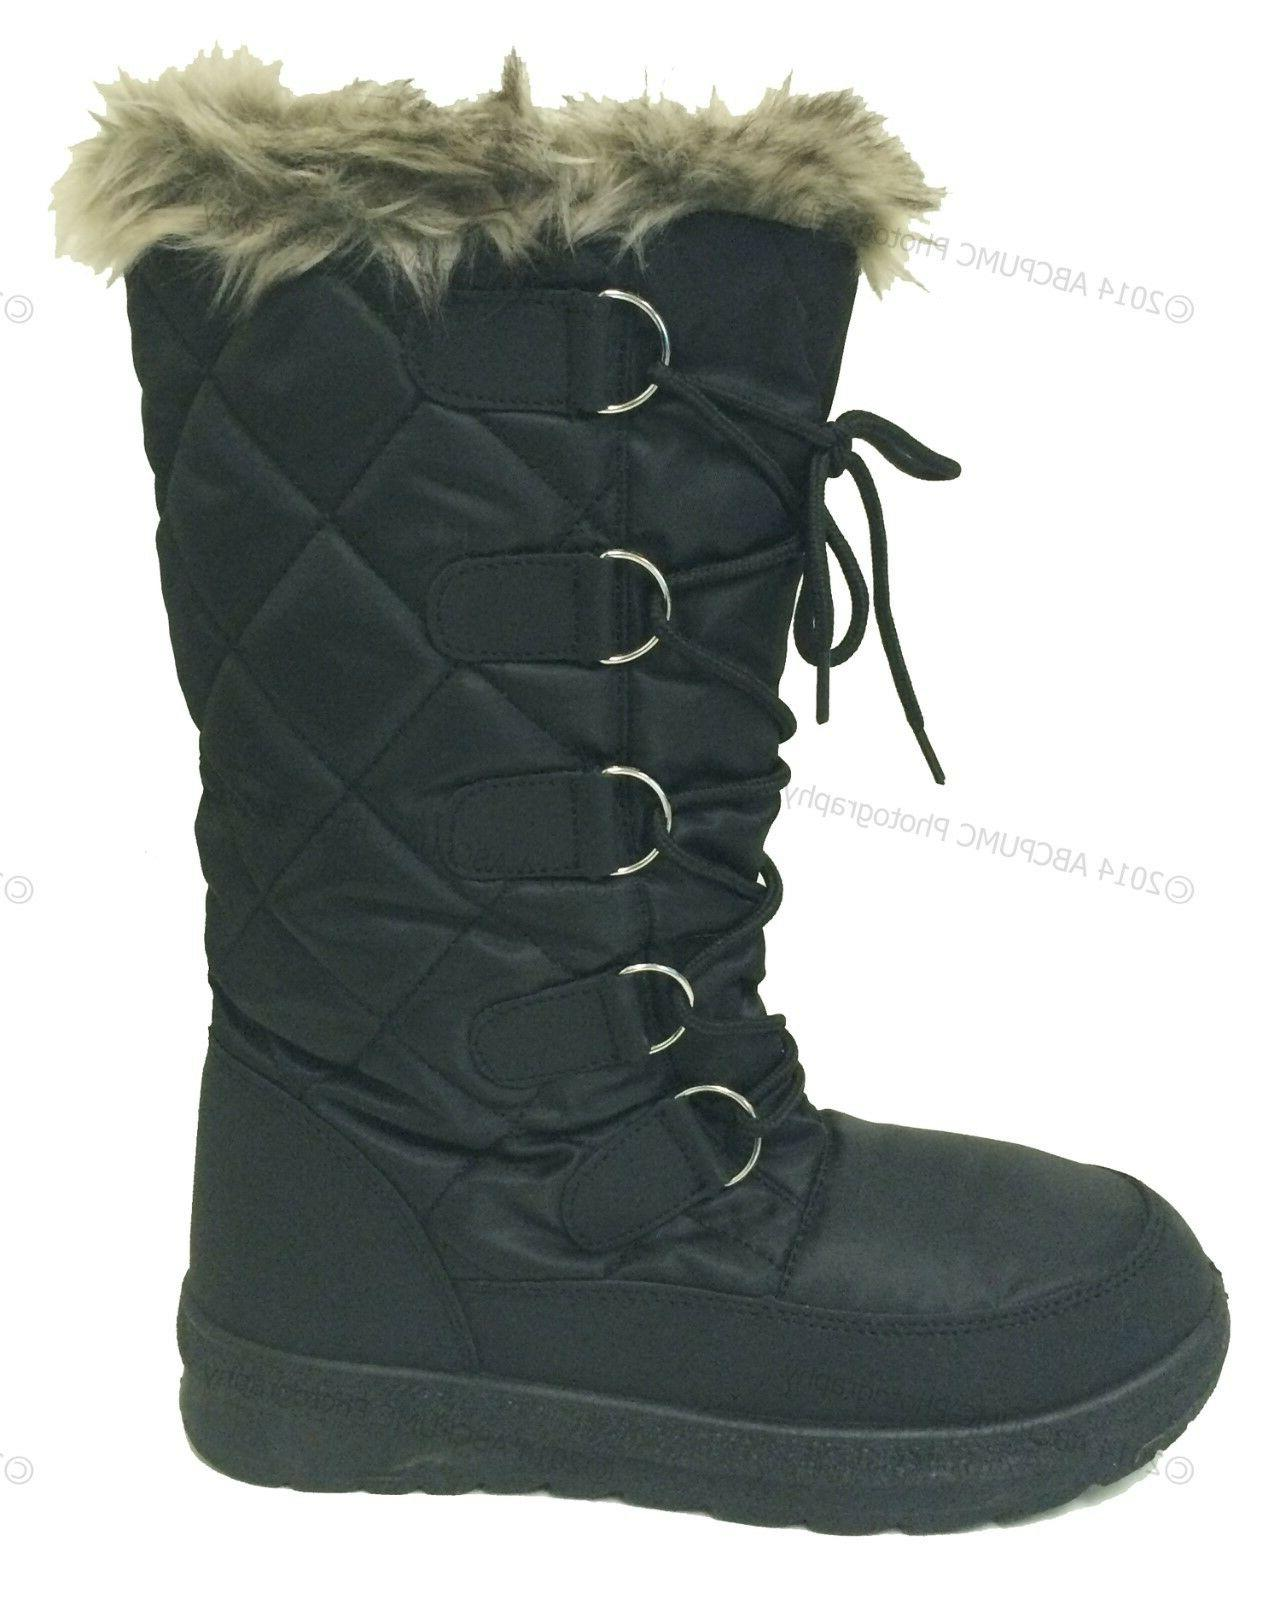 Women's Winter Fur Warm Insulated Zipper Shoes,